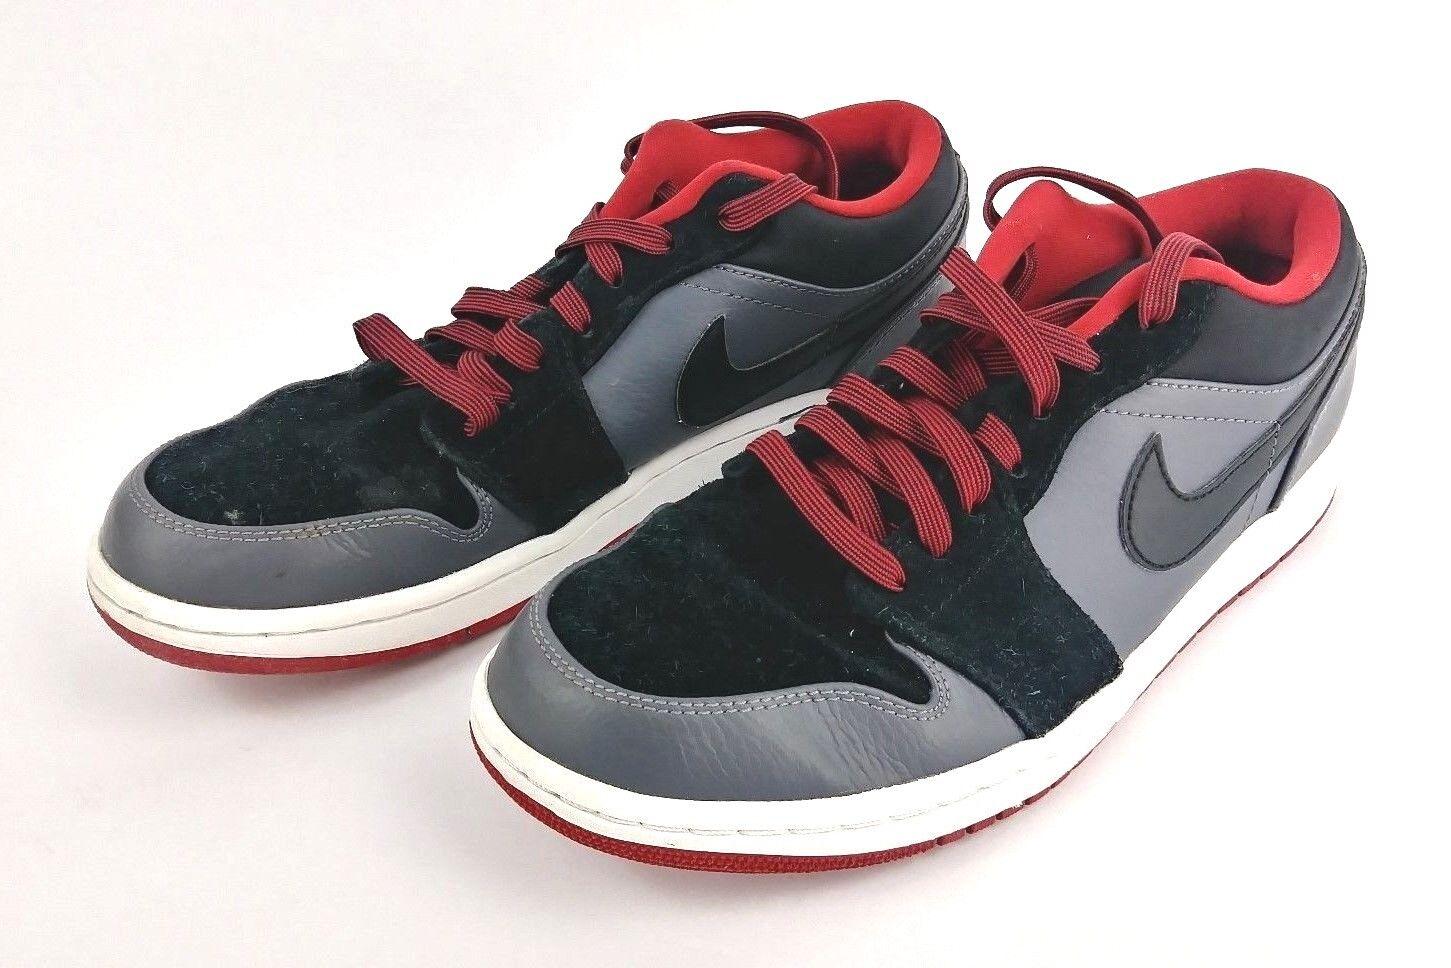 Air jordan 1 basso Uomo scarpe / 553558-002 rosso - nero / scarpe grigio misura 8,5 a0d939